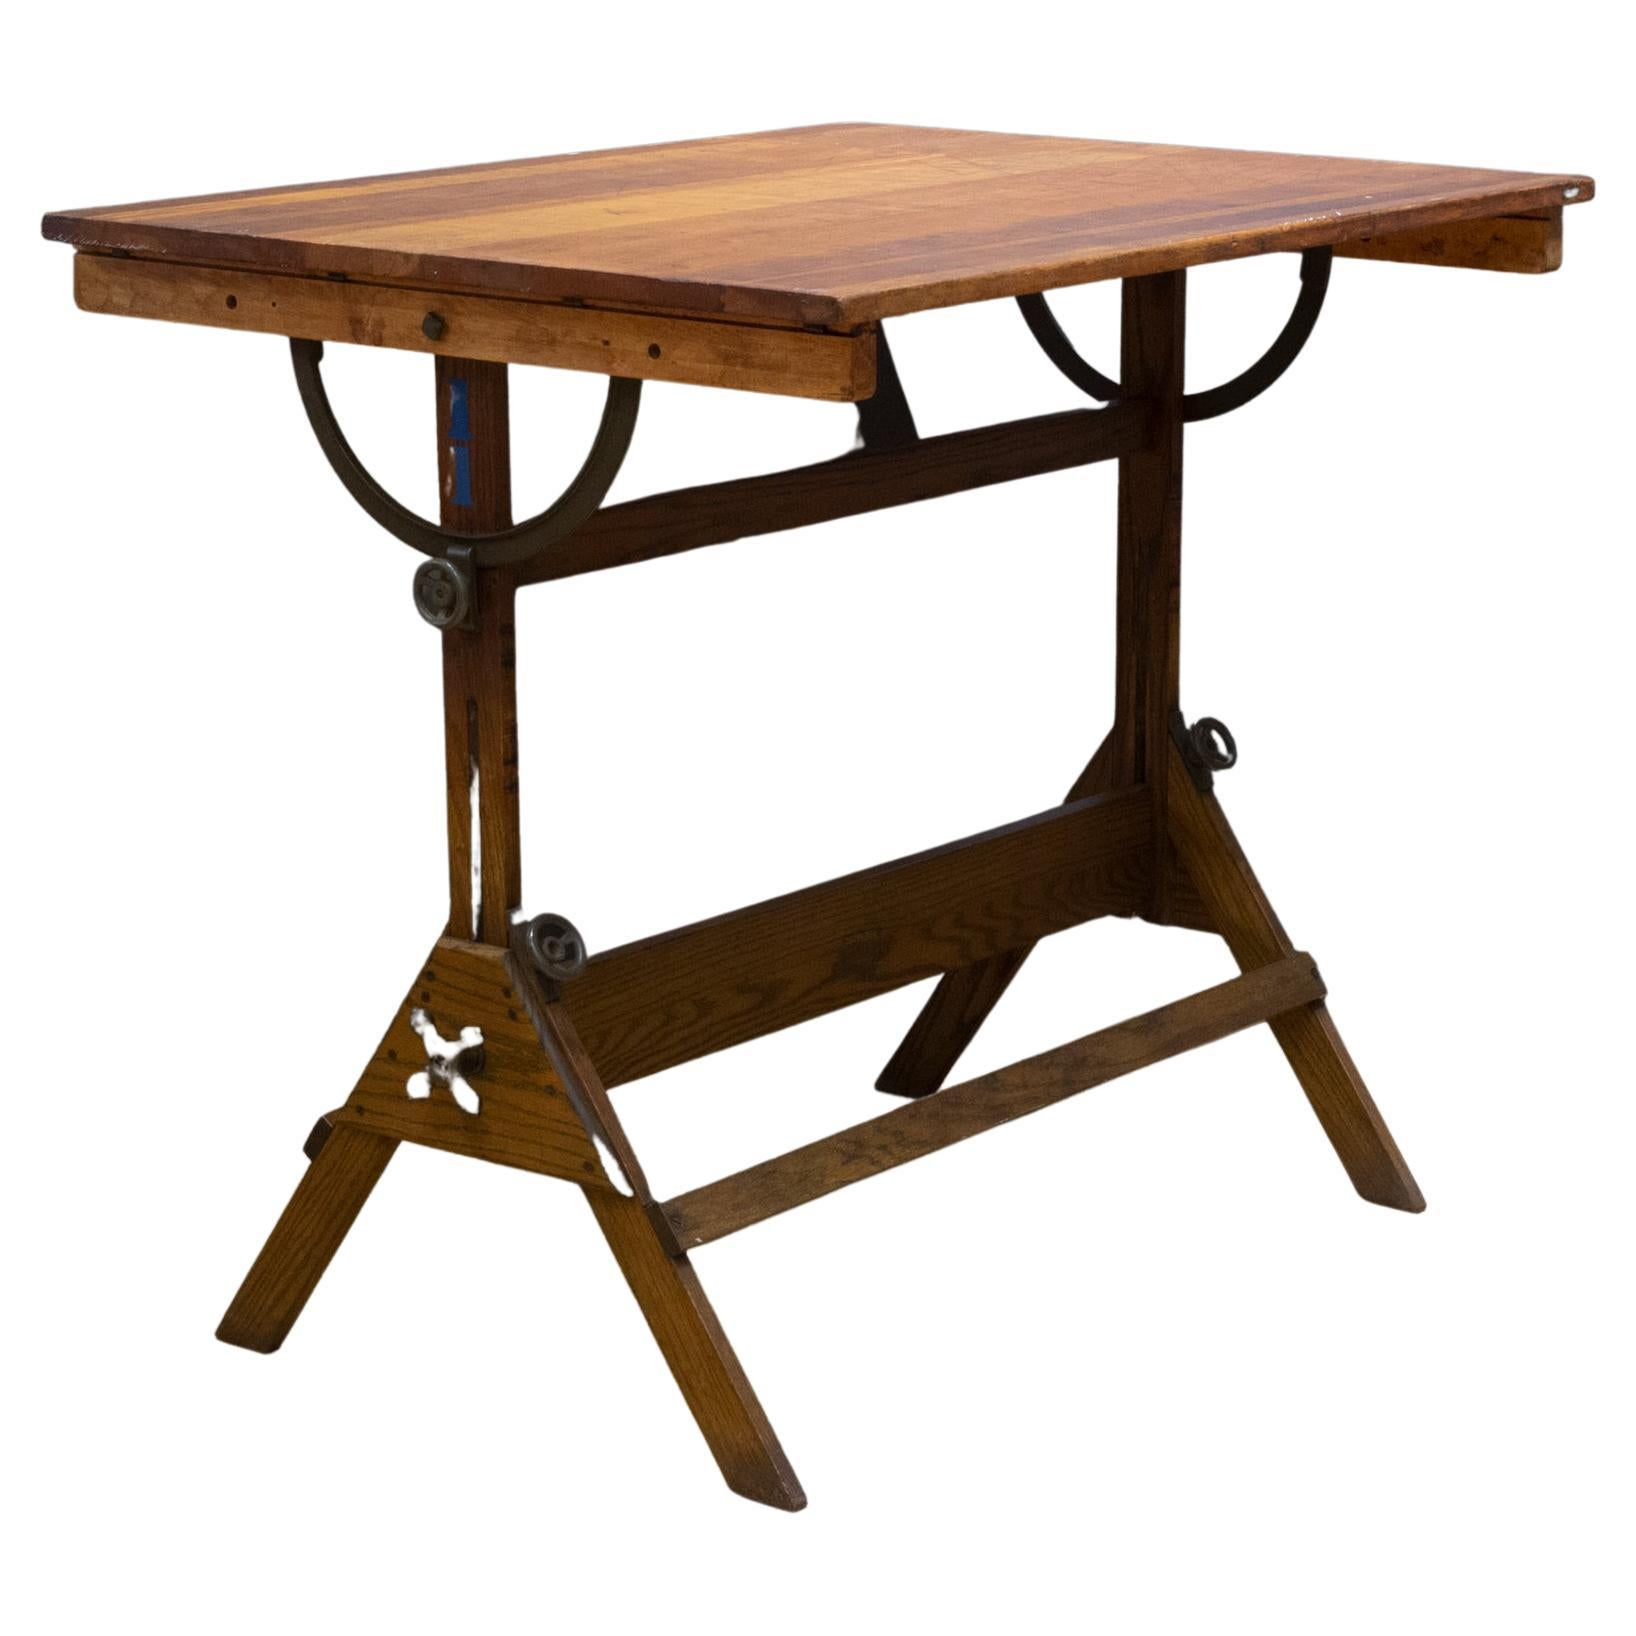 Dietzgen Drafting Table/Dining Table/Desk, c.1930